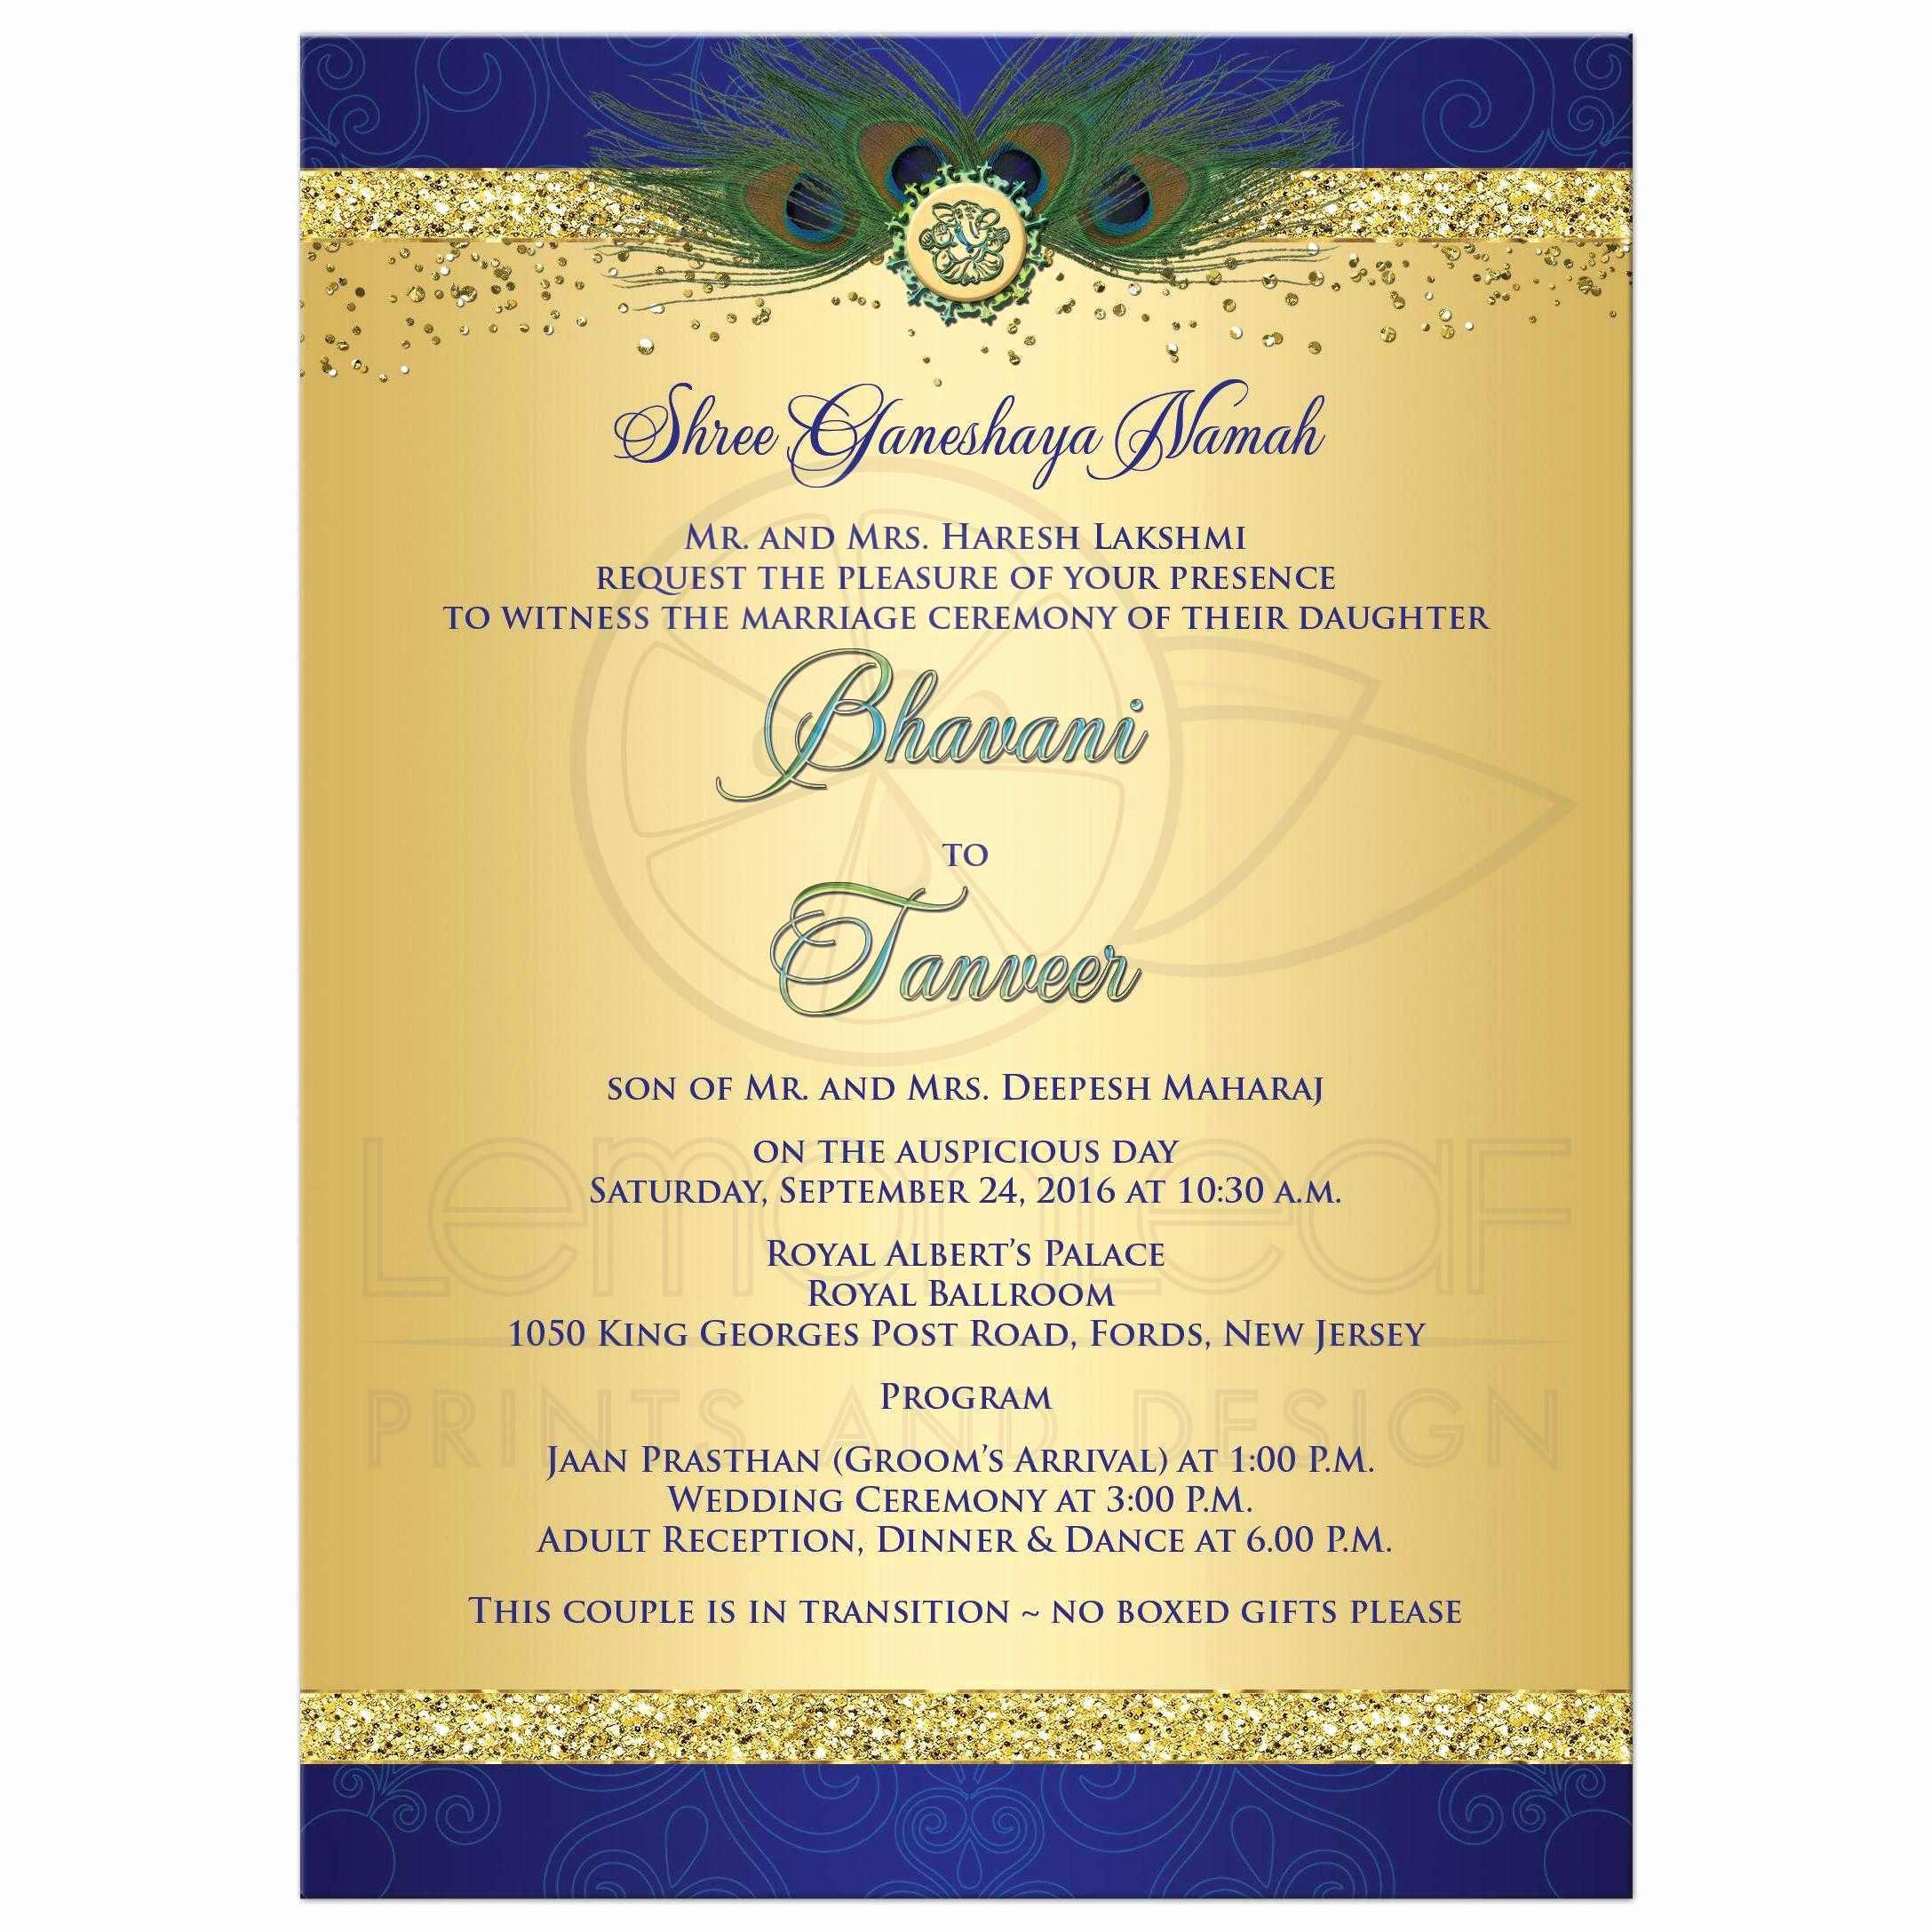 Indian Wedding Invitation Sample Awesome Indian Wedding Invitation Cards Indian Wedding